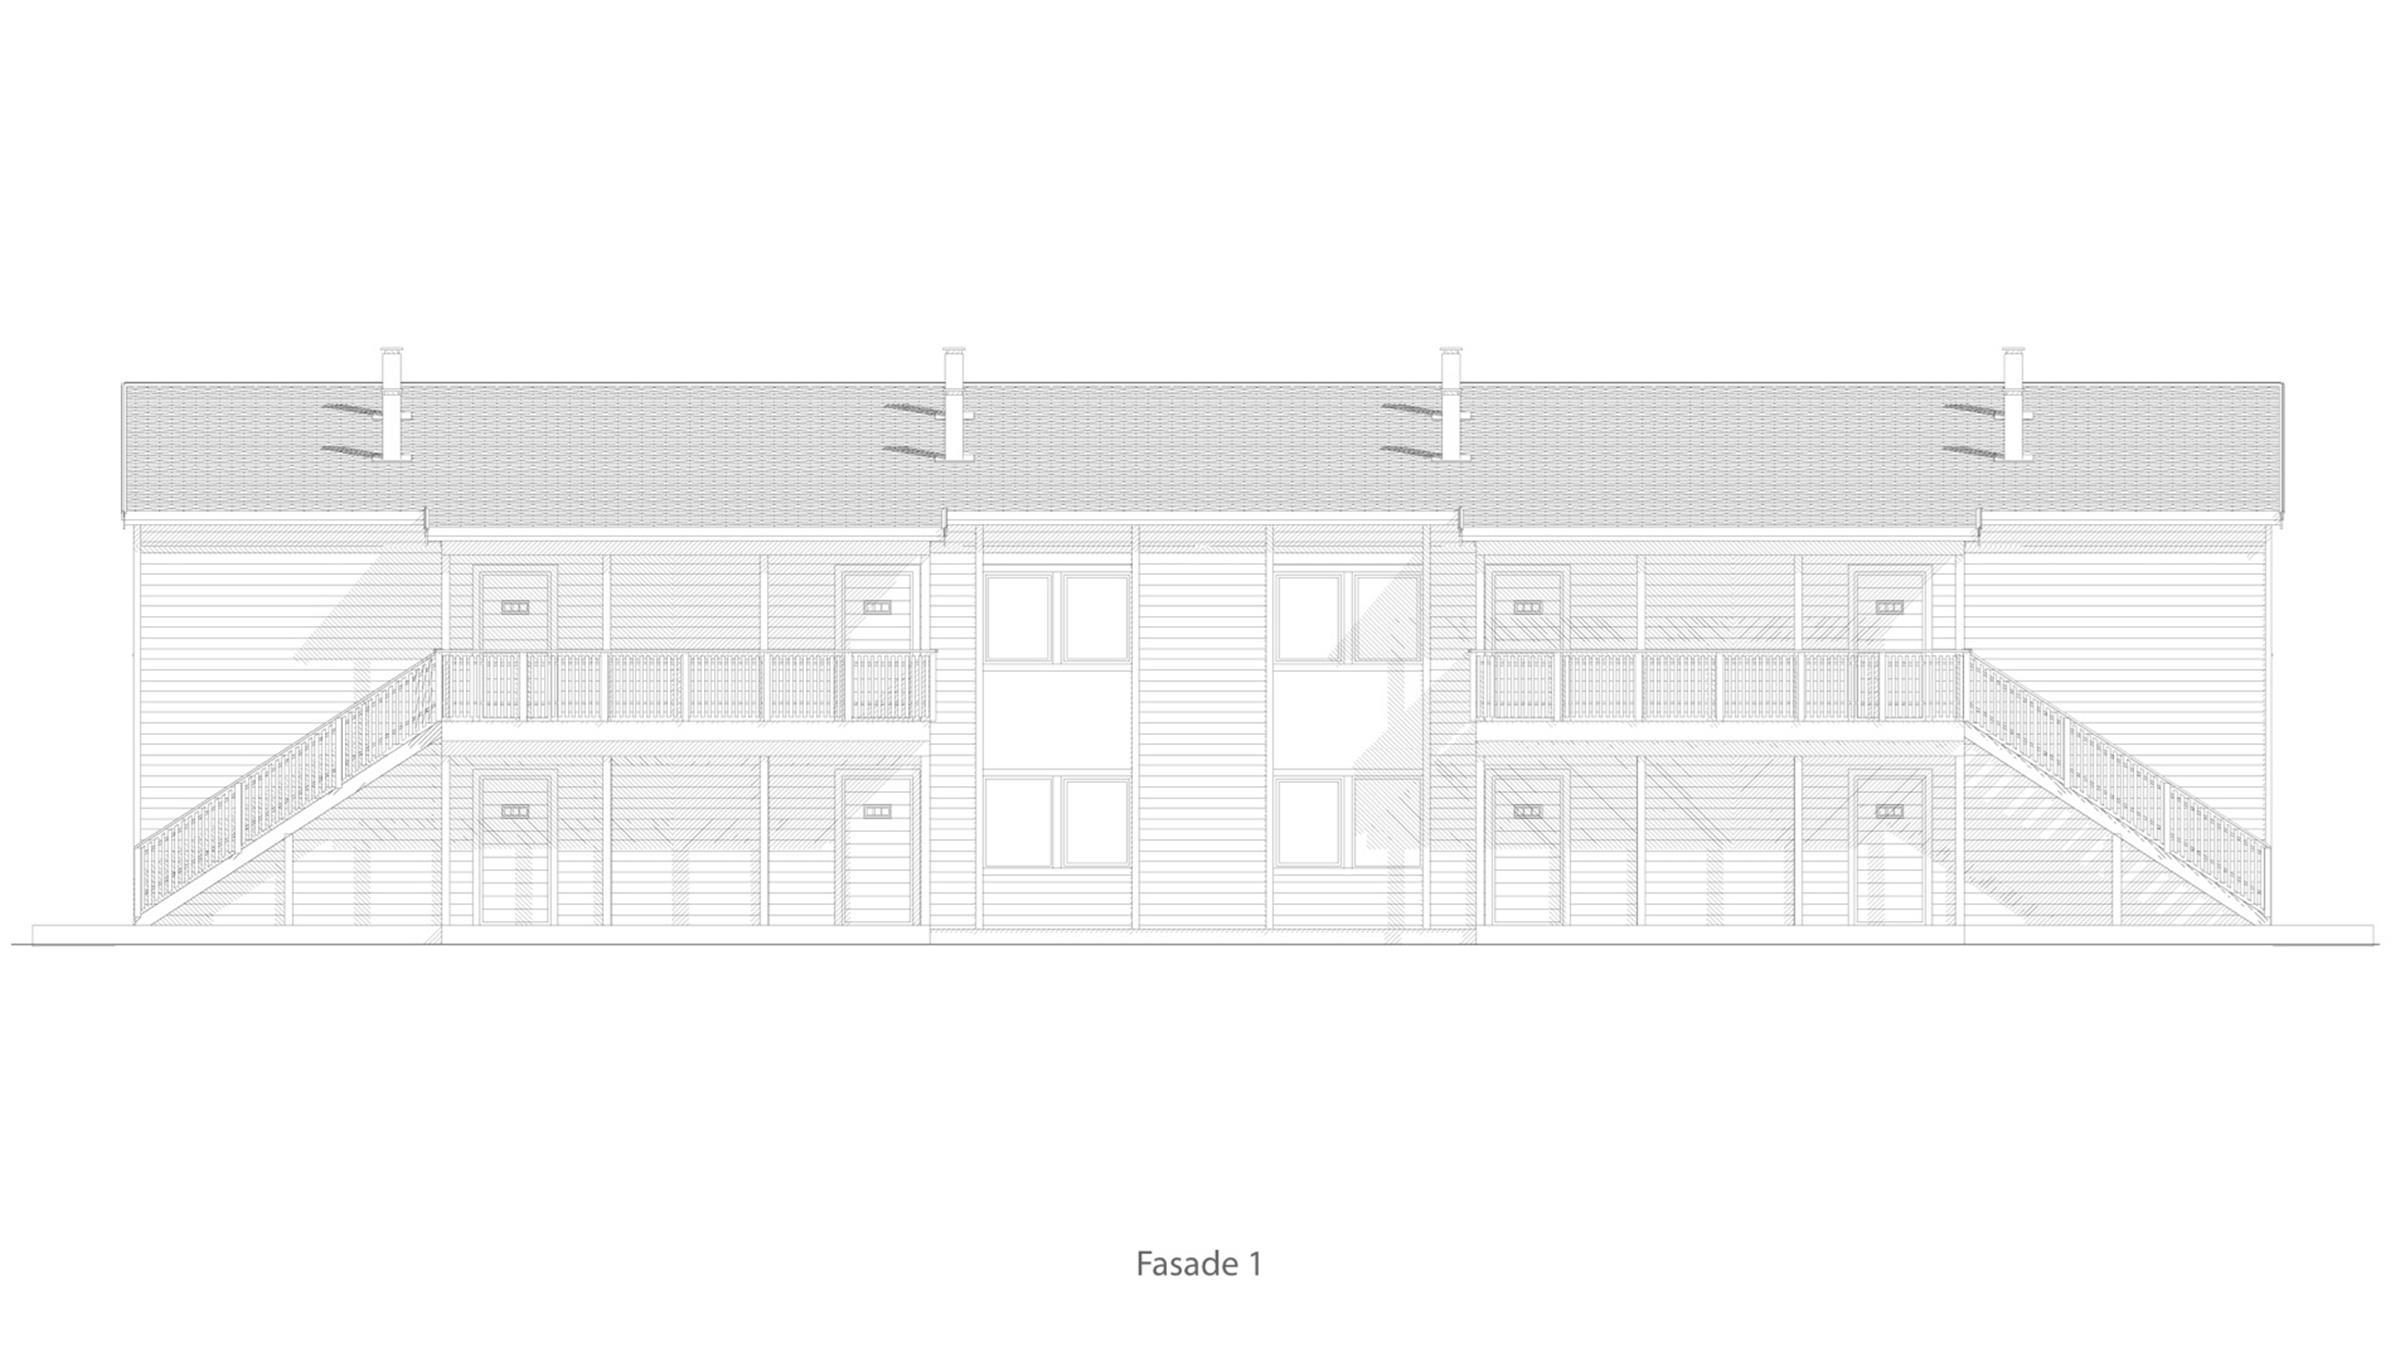 Egersund fasade 1